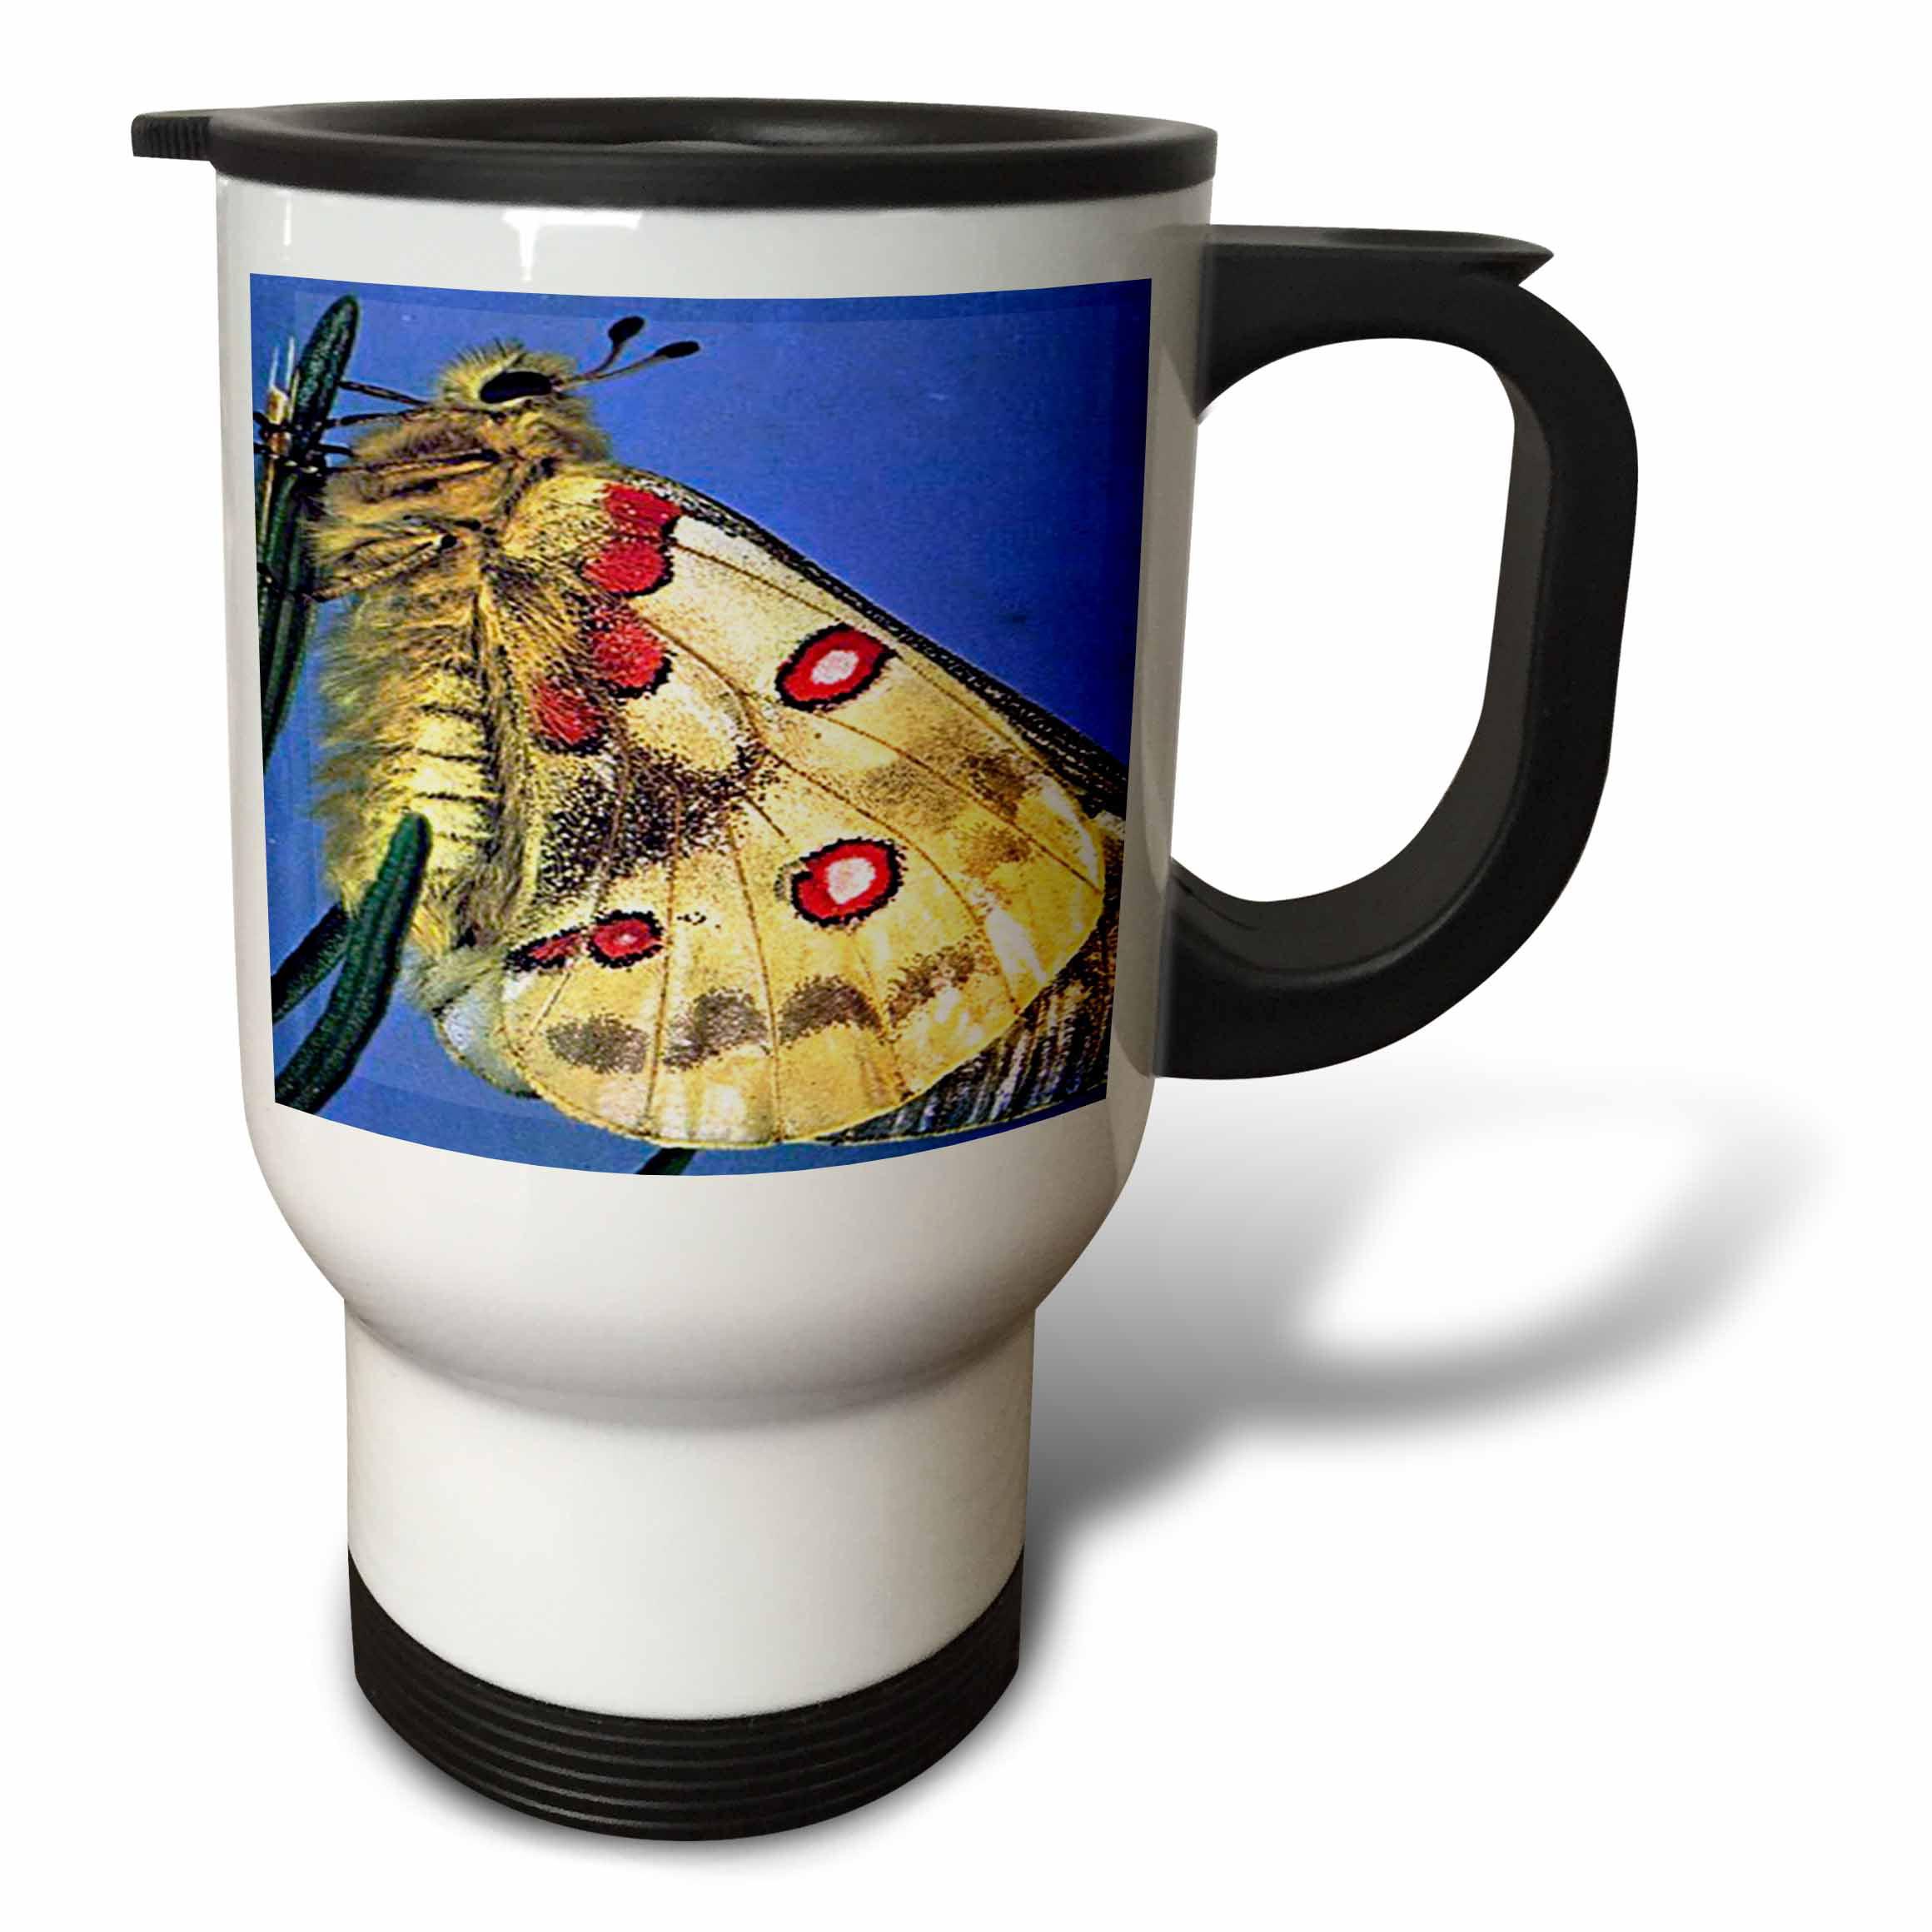 3dRose Beautiful Moth, Travel Mug, 14oz, Stainless Steel